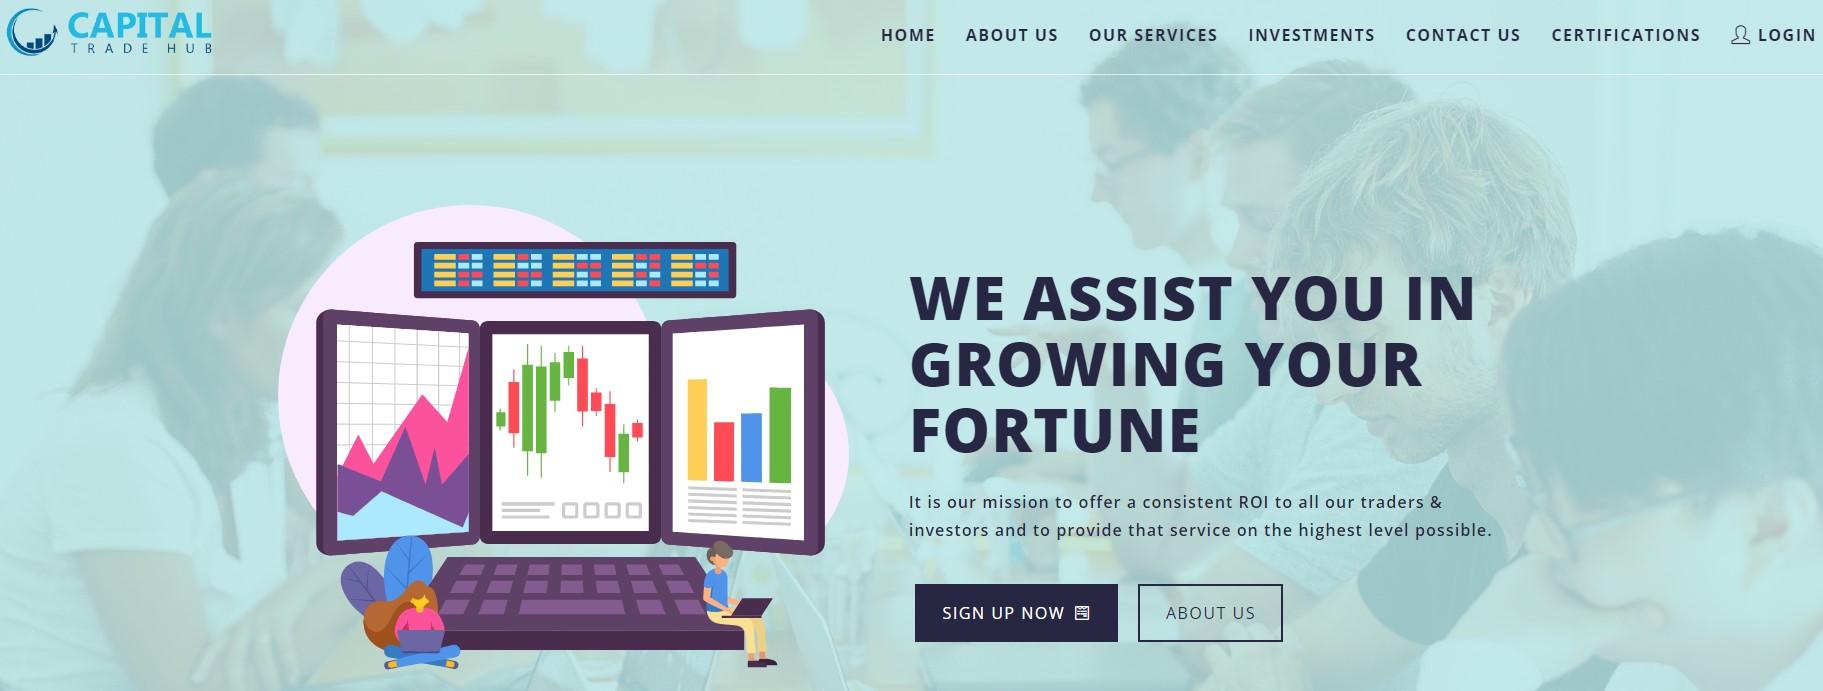 Capital Trade Hub scam